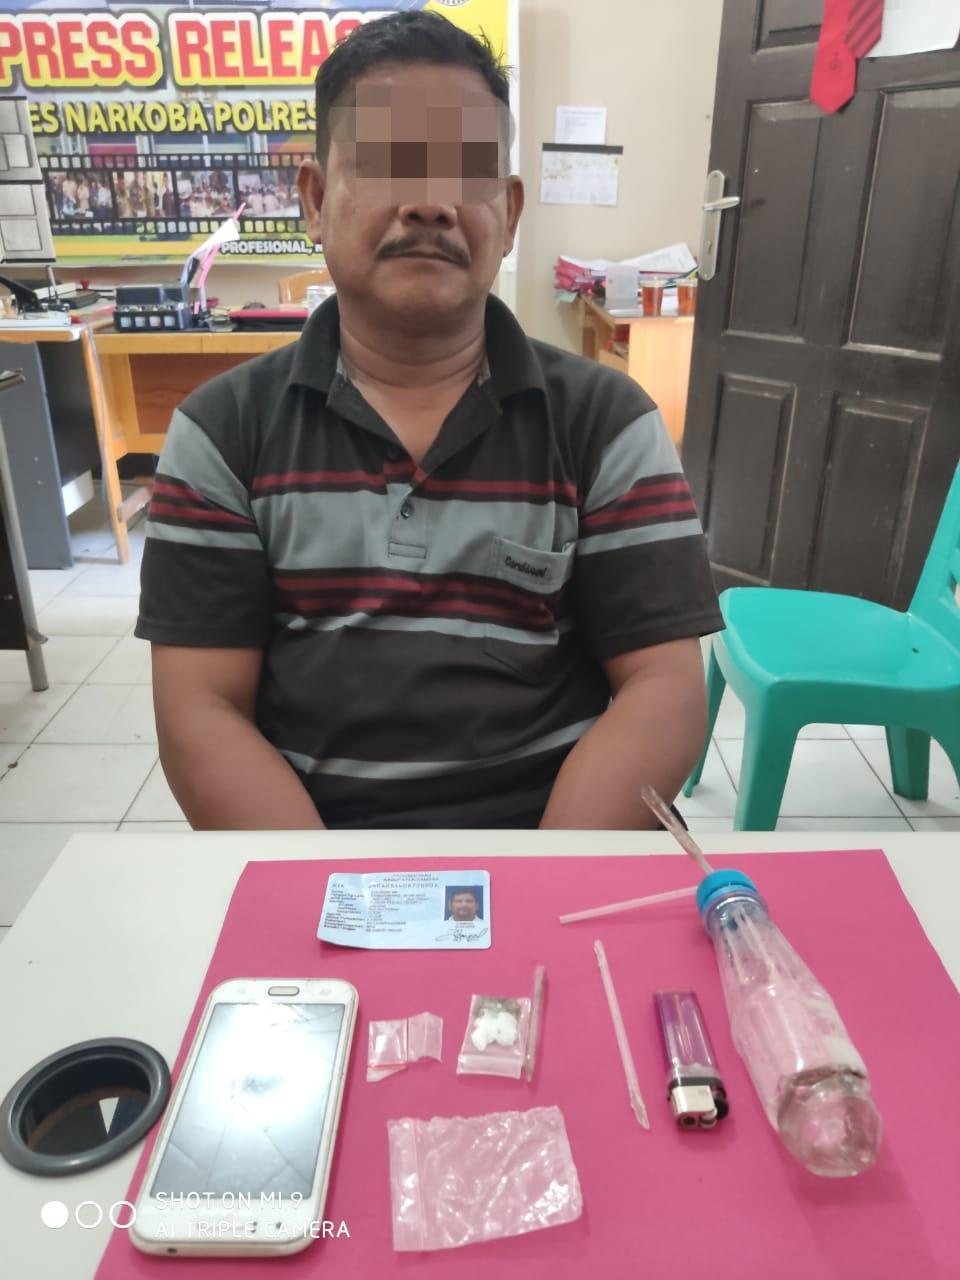 Resnarkoba Polres Kampar Tangkap Seorang Pengedar Shabu dan Daun Ganja Lebaran Hari Ke 2